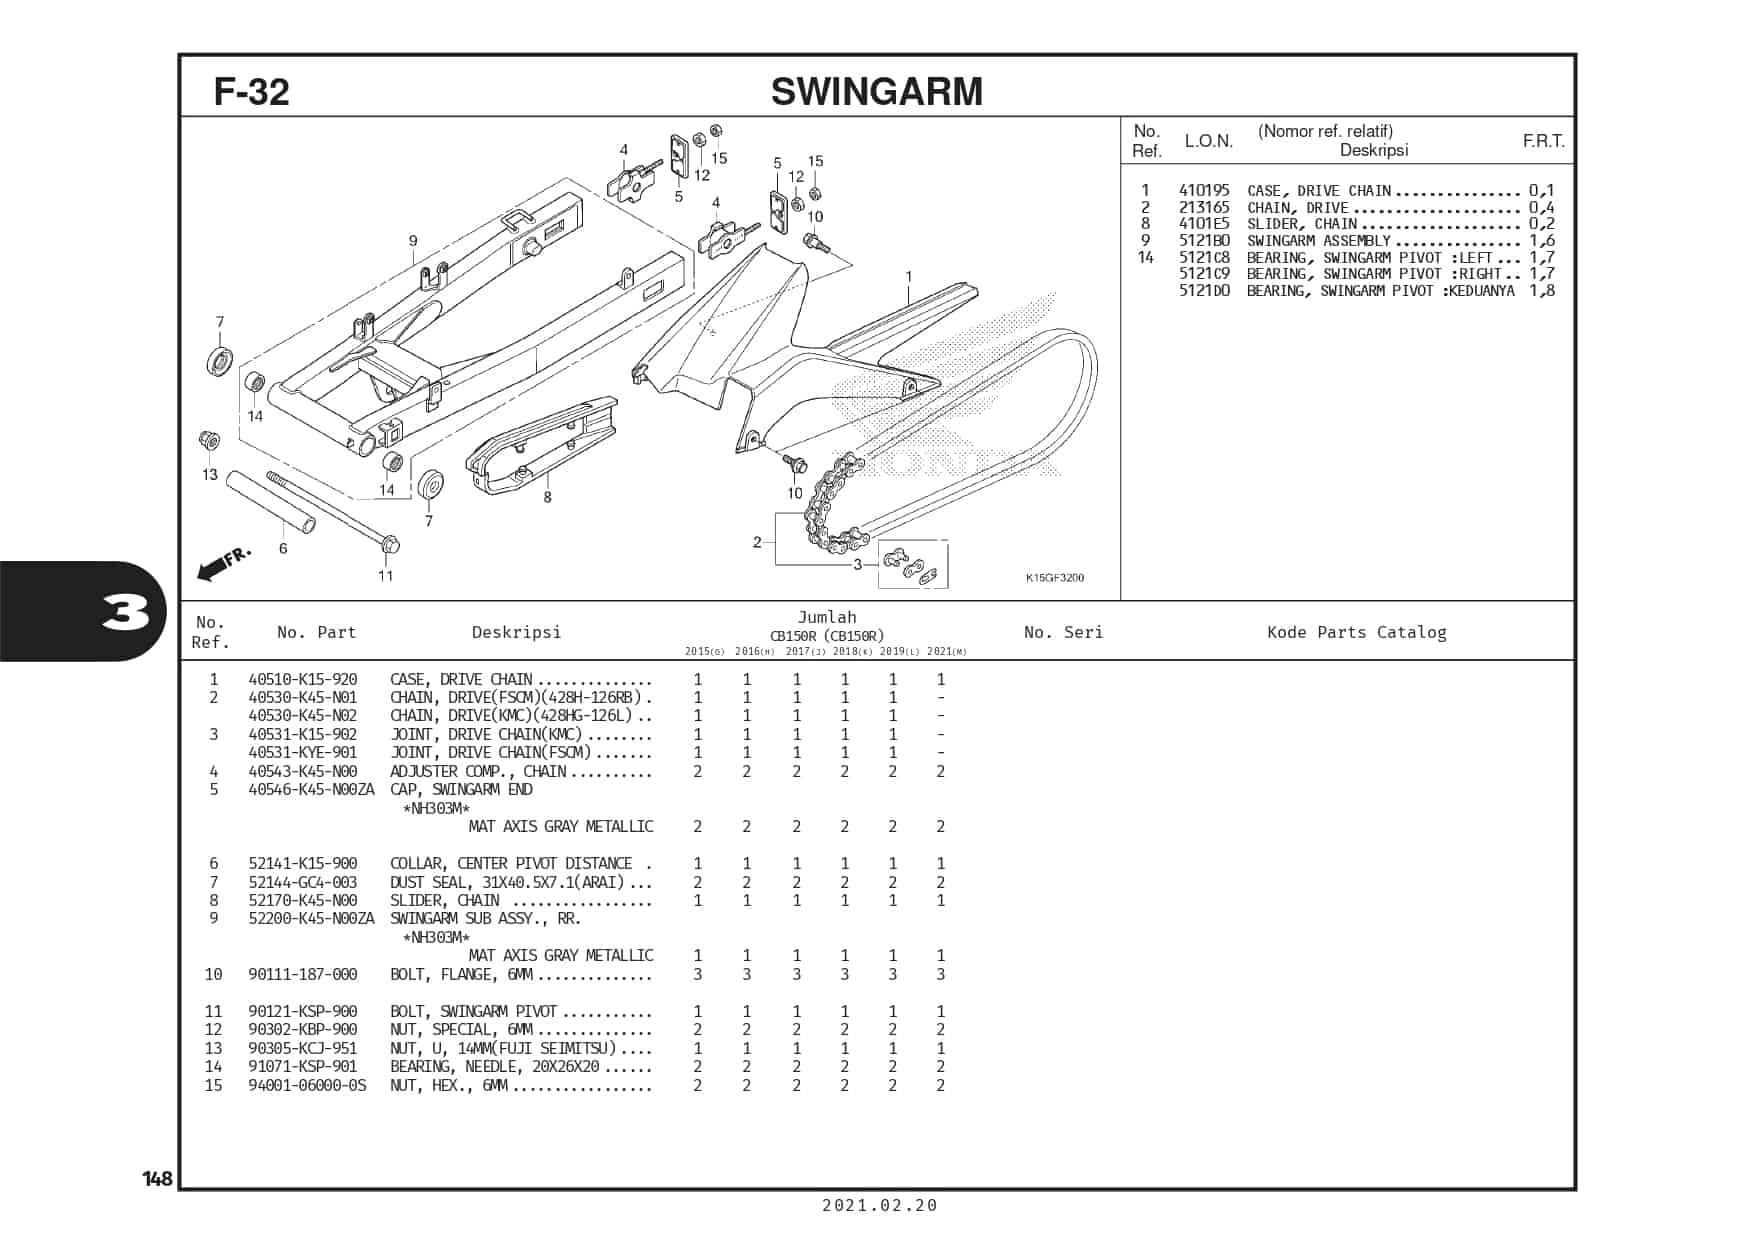 F-32 Swingarm